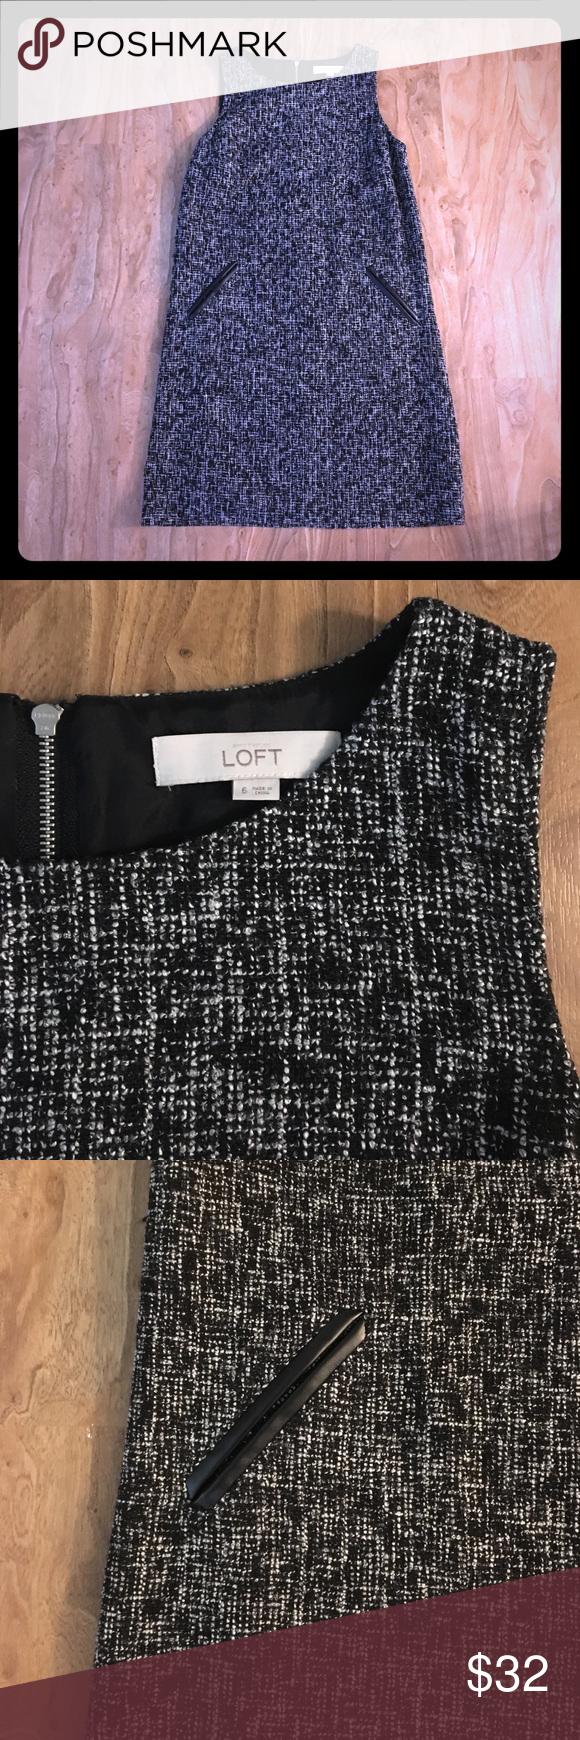 Black and white tweed dress from Loft LOFT black and white tweed dress with leather pocket embellishments. (Not real pockets). LOFT Dresses Midi